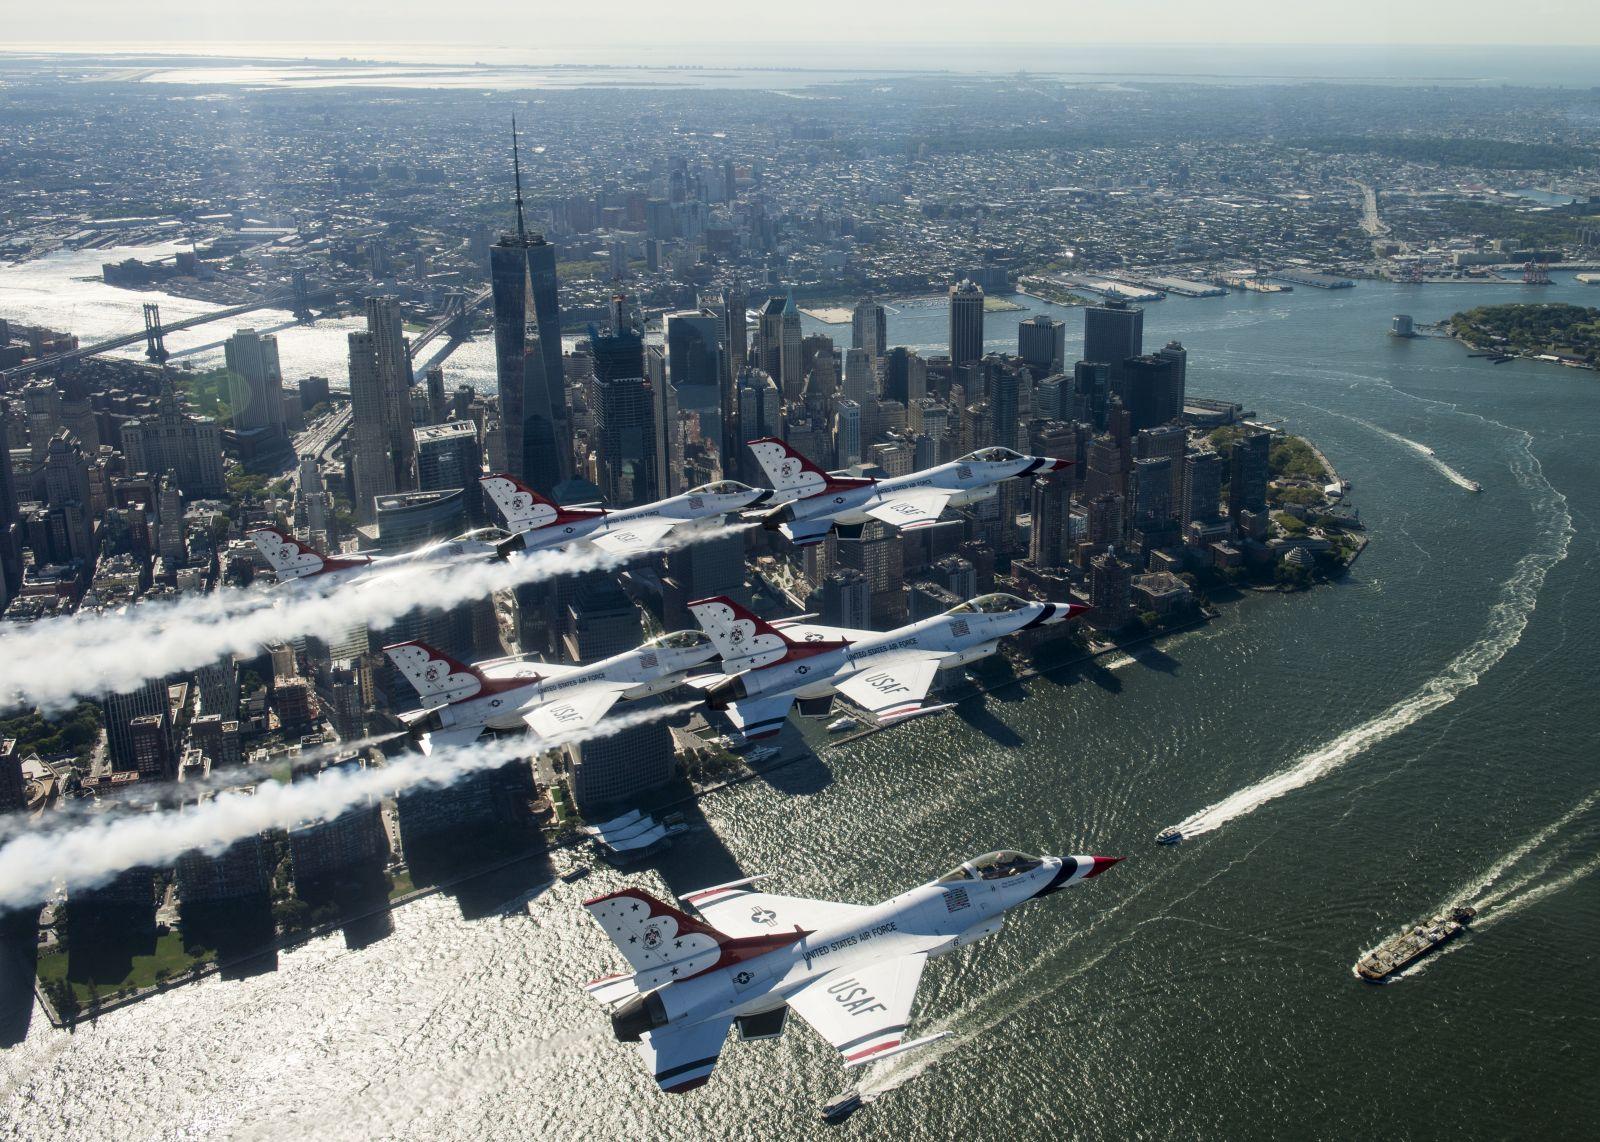 Уникално авиошоу на 22 август над Манхатън!